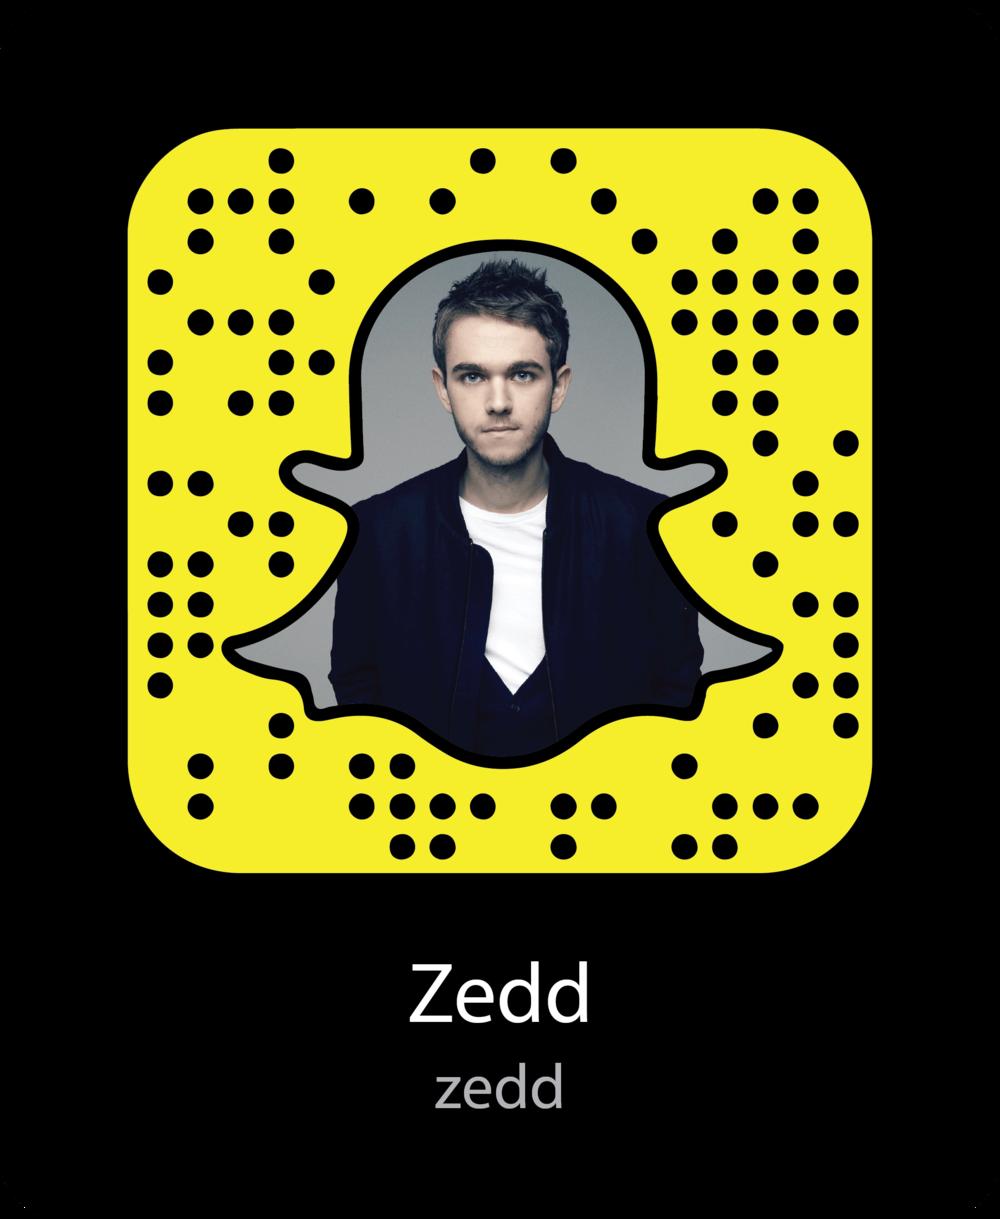 zedd-celebrity-snapchat-snapcode